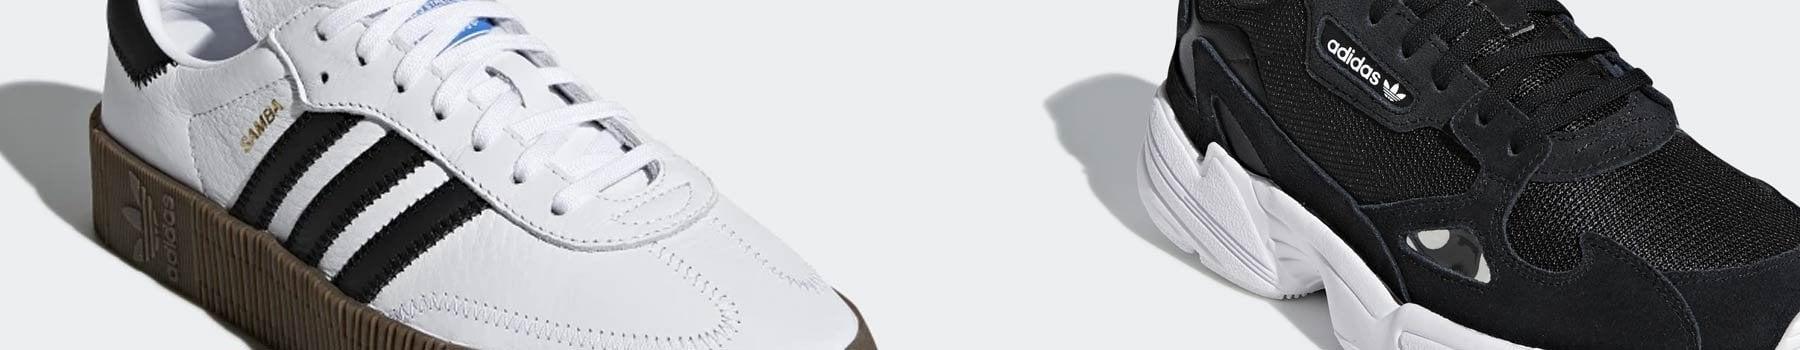 more photos 07778 a3460 Adidas Originals Womens Release Dates. Womens Sneaker Releases